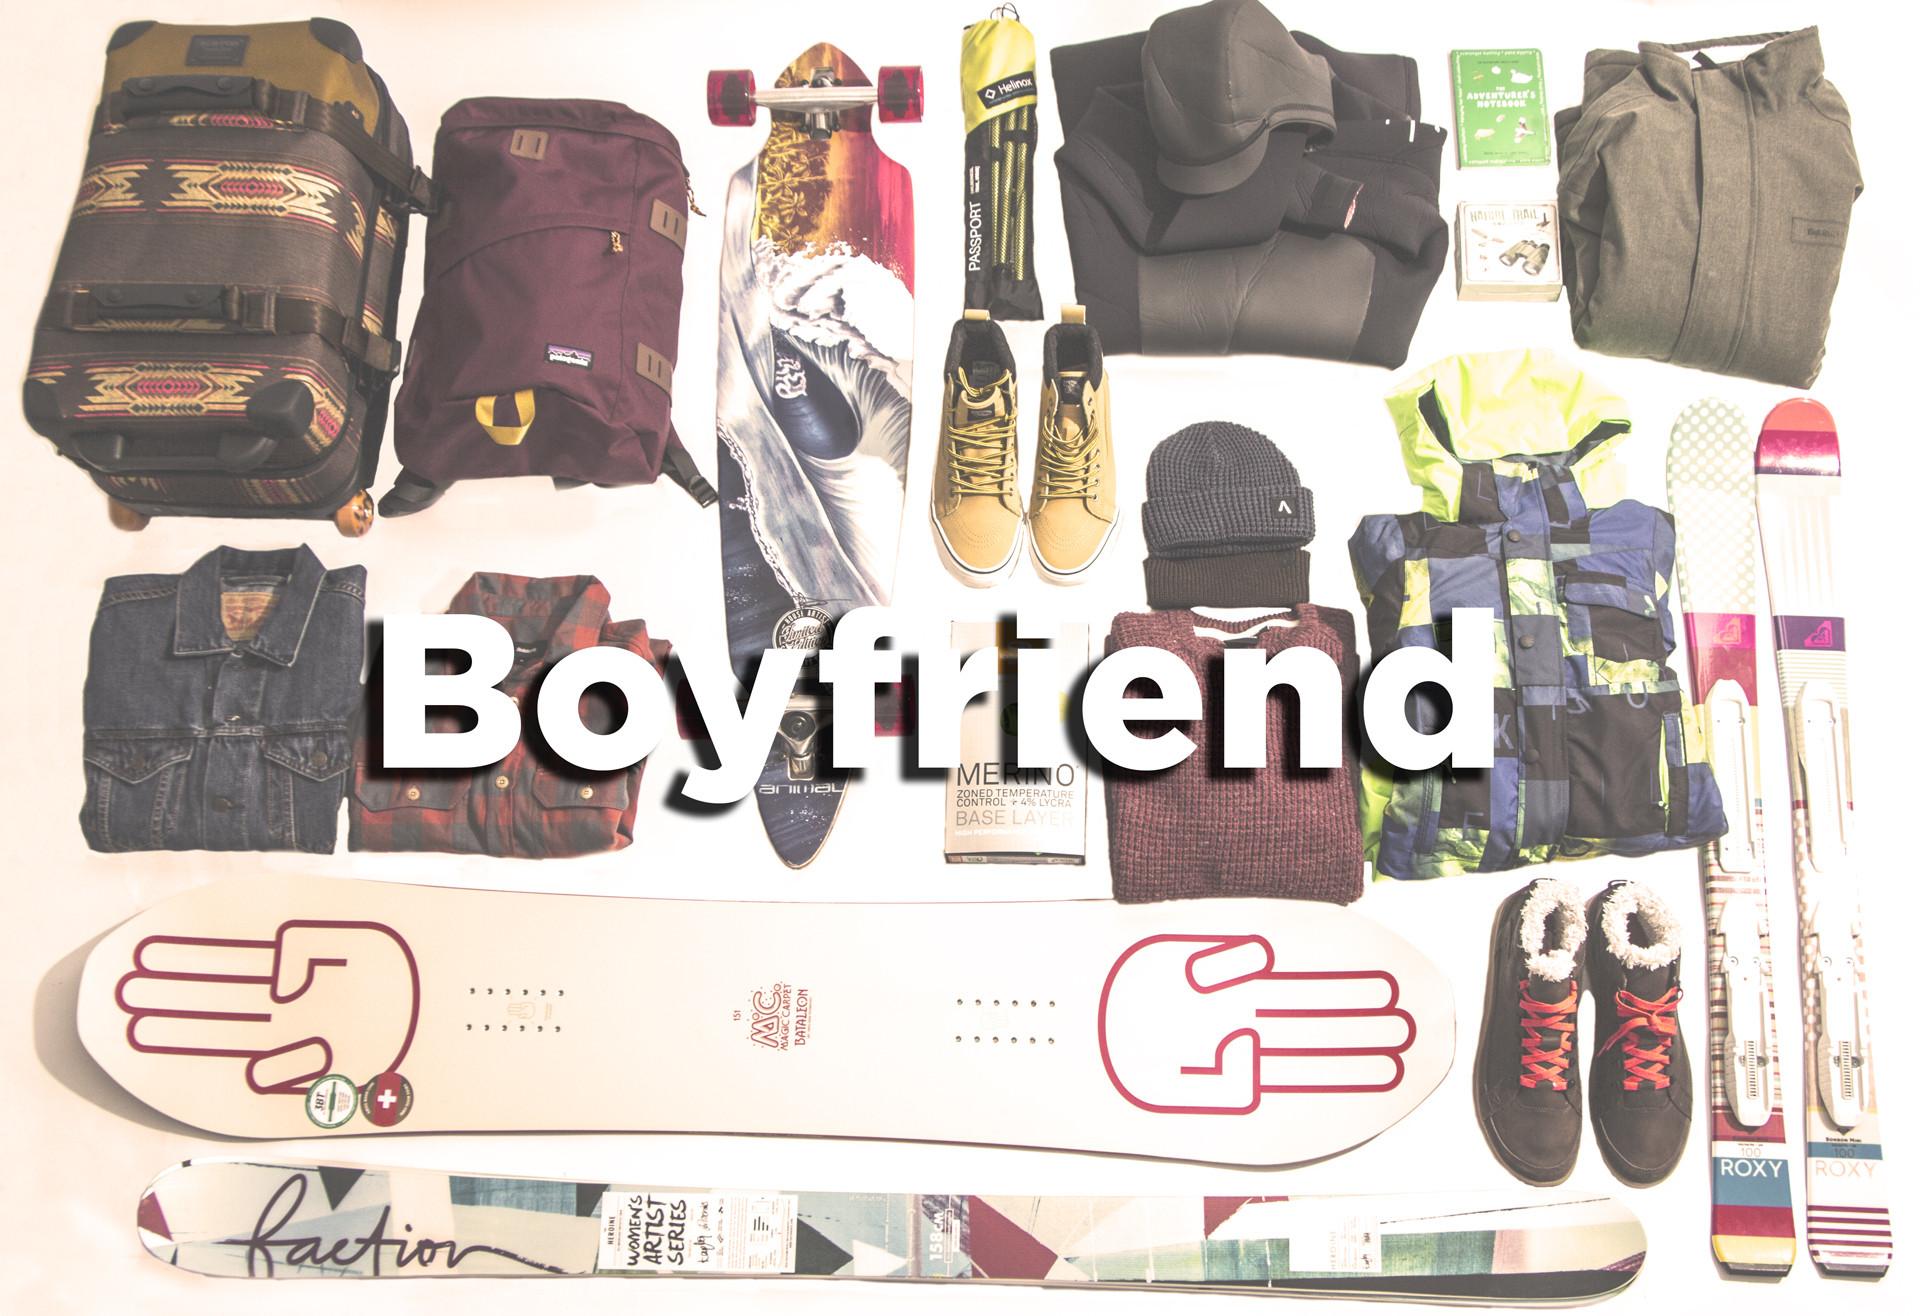 Christmas Gift Ideas For Boyfriend  Christmas Gift Ideas For A Boyfriend 15 Great Gifts